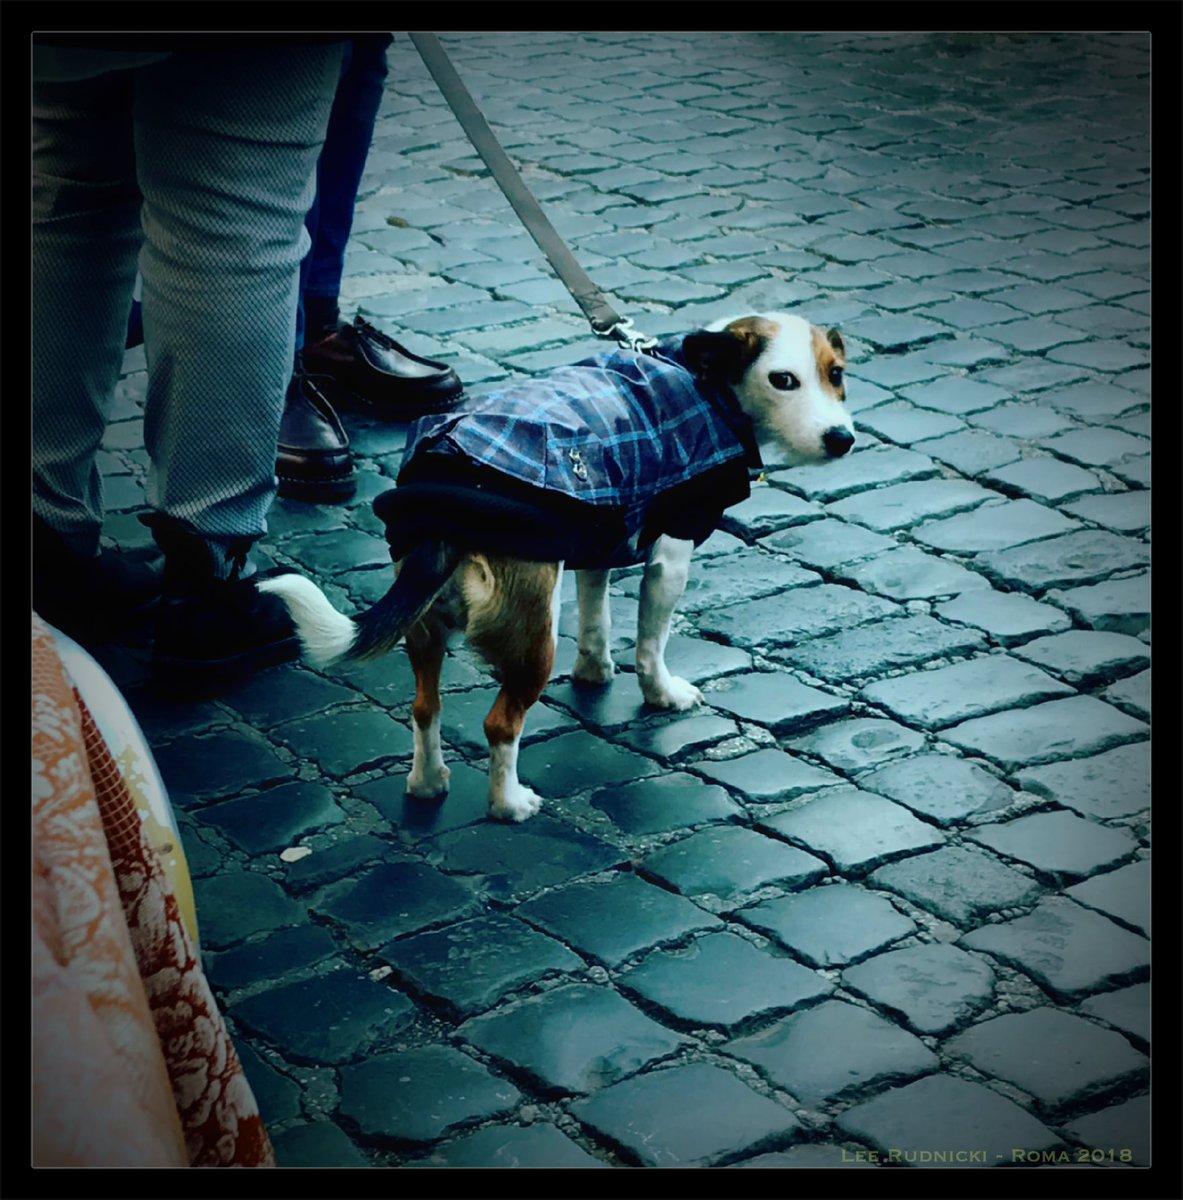 Roma Dog 3 #leerudnicki #photography #rome #roma #italy #italia #travel #ig #art #love  #picoftheday #igersroma #instagood #romeitaly #photooftheday #travelphotography #lazio #europe #igersitalia #paris #like #visitrome #instagram #history #photo #follow #travelgram #bhfyp #dog https://t.co/EjYMGfcjsF